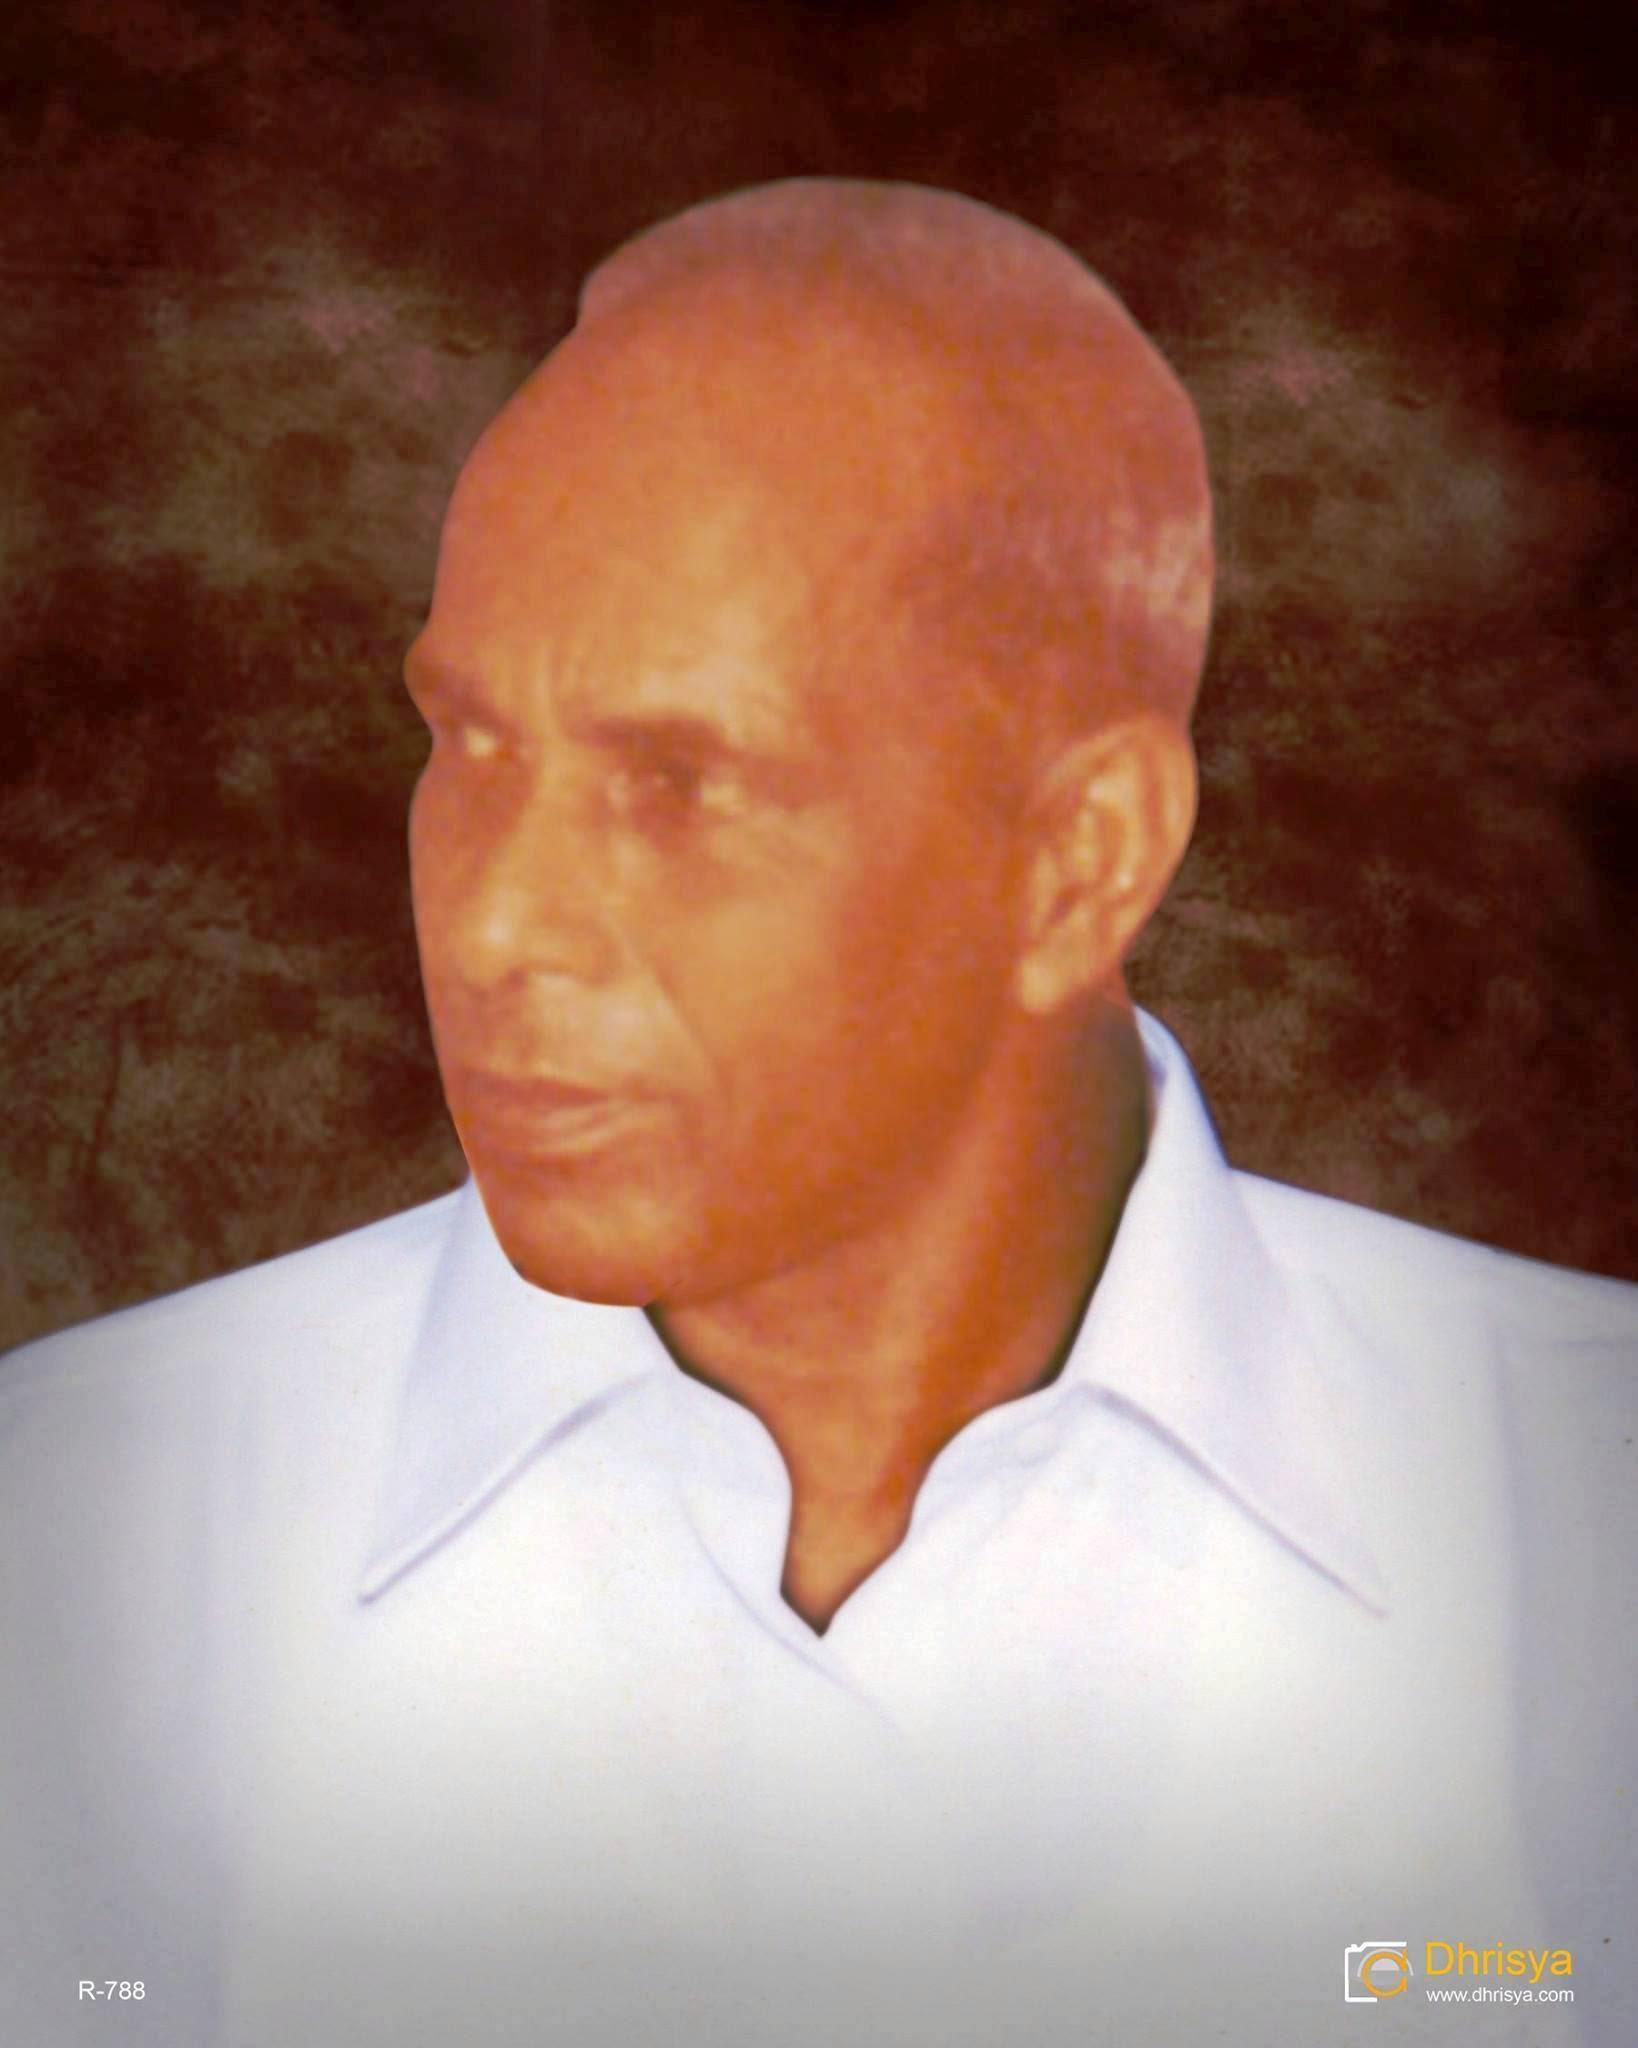 Photo: my passed away grandfather: sri Kunjukunju vilayil ayathil Panicker